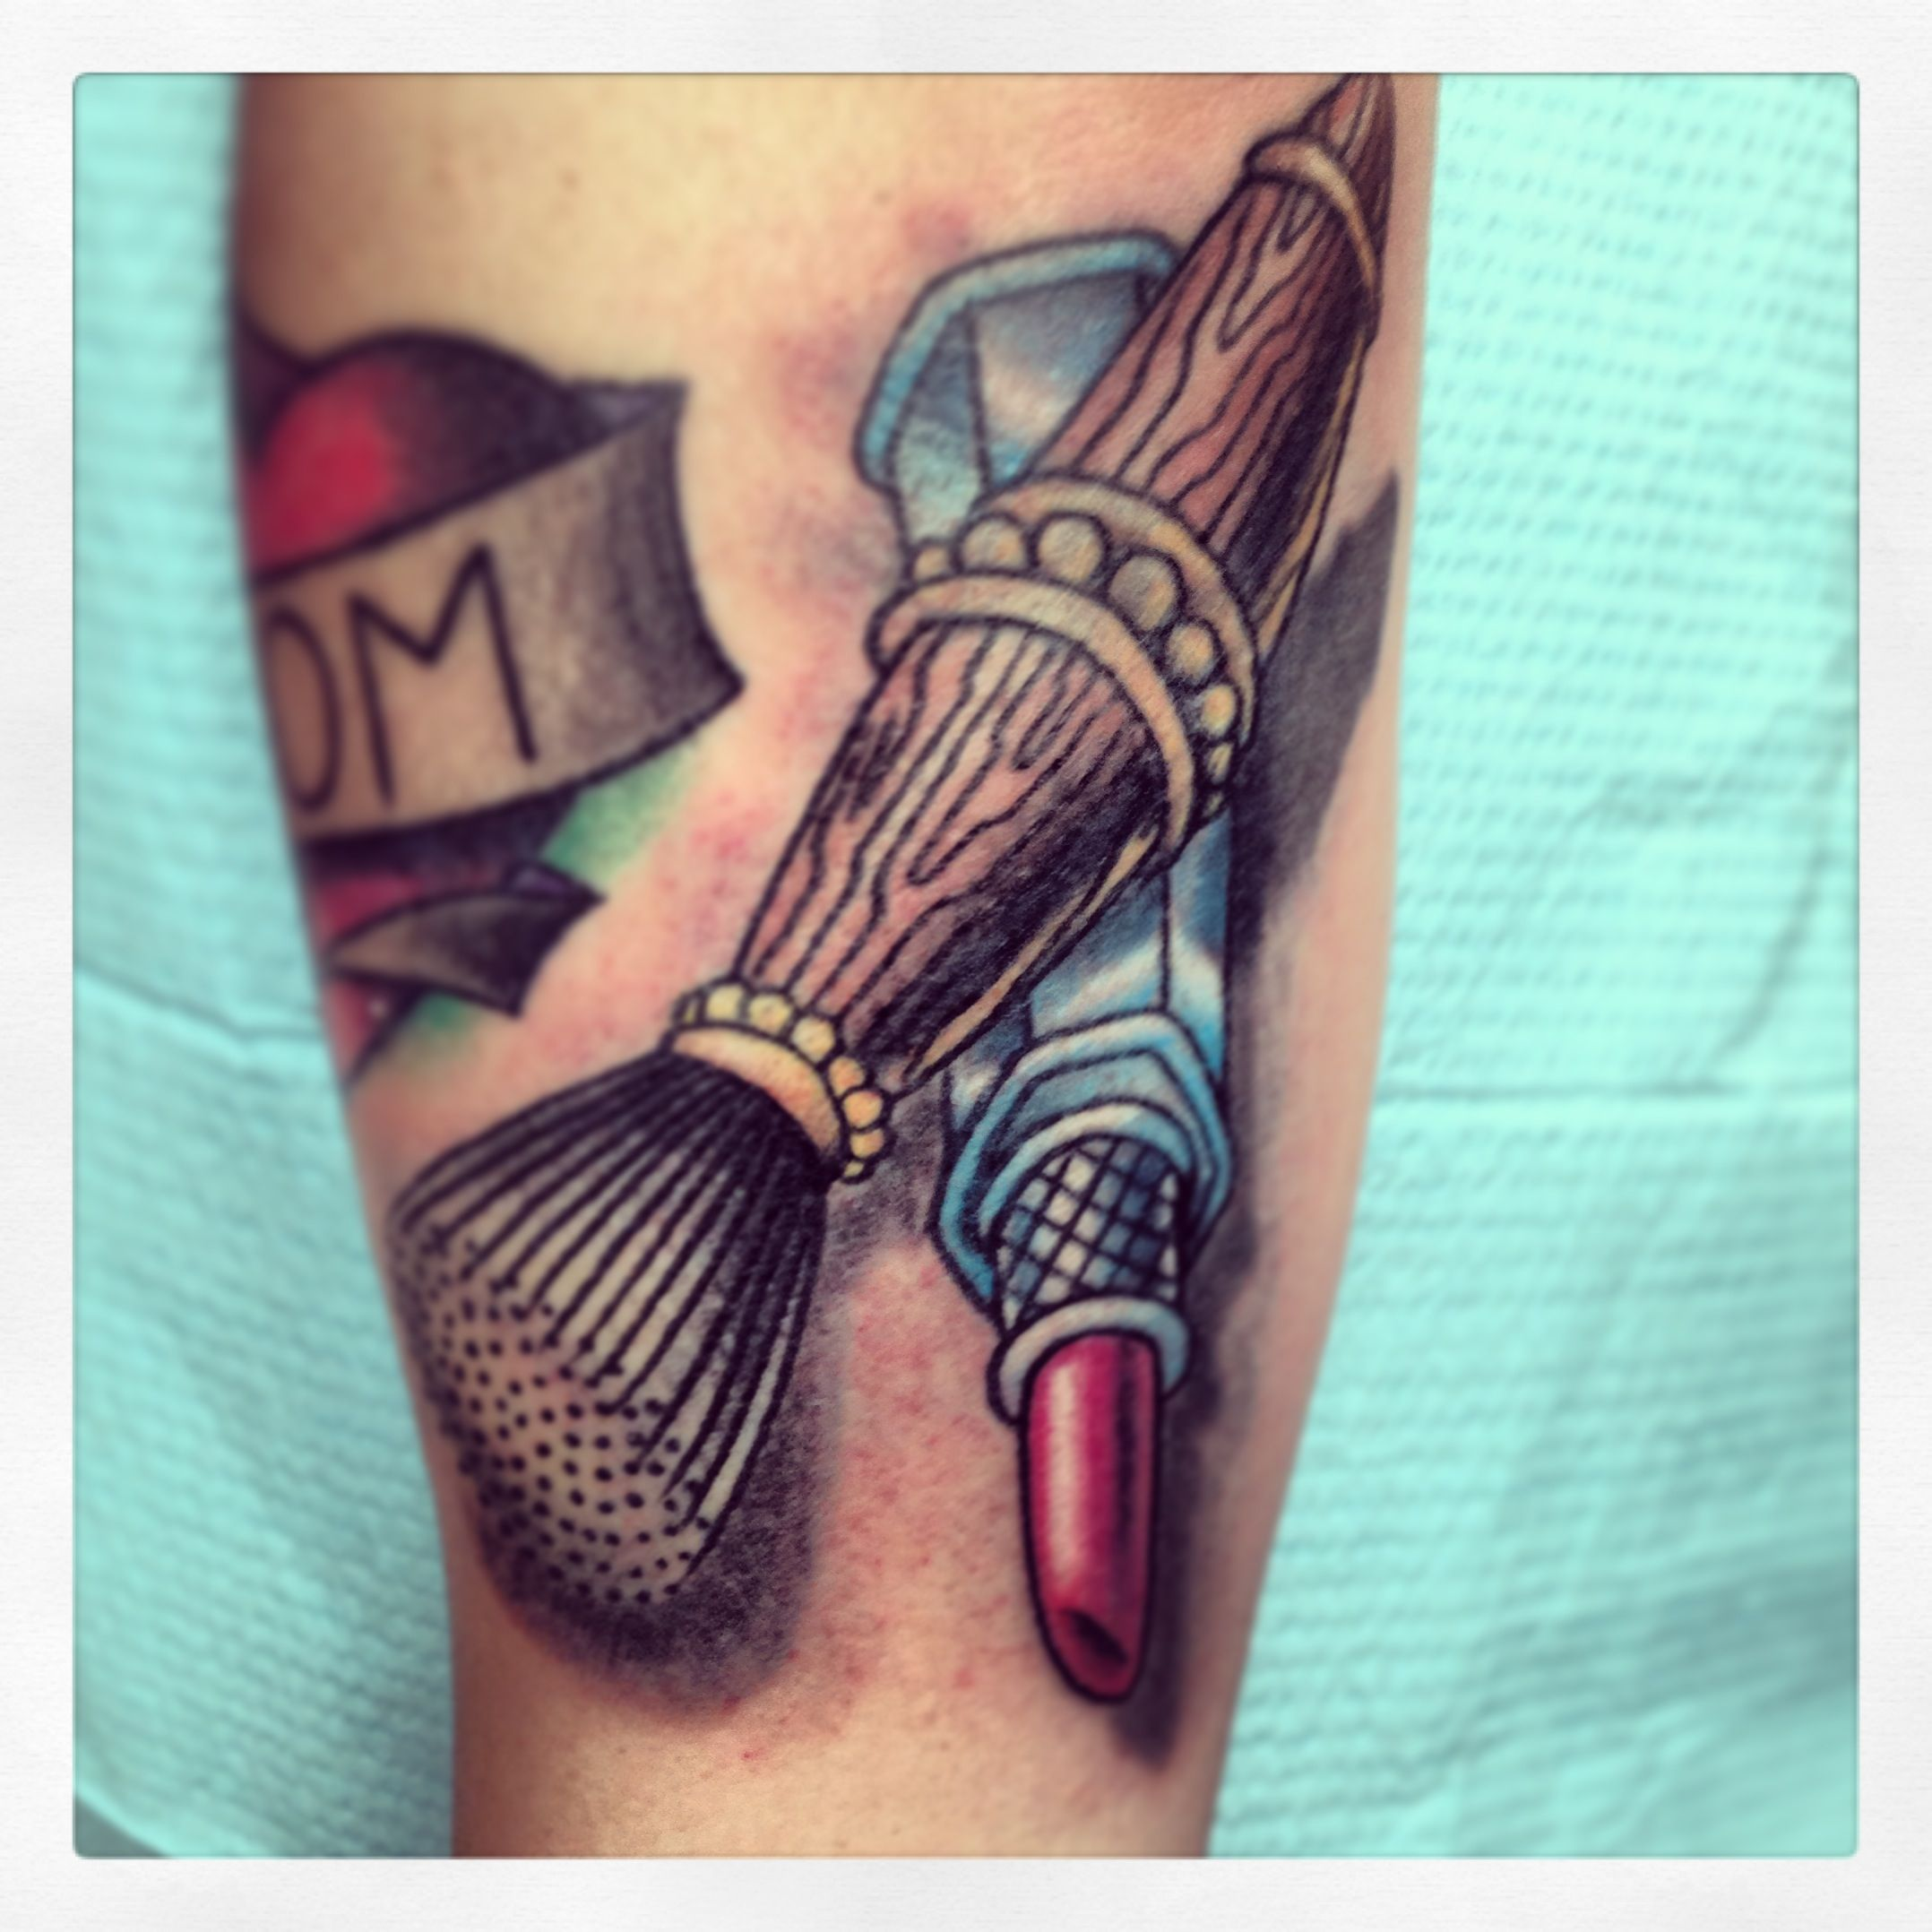 makeup artist tattoo ideas - photo #11